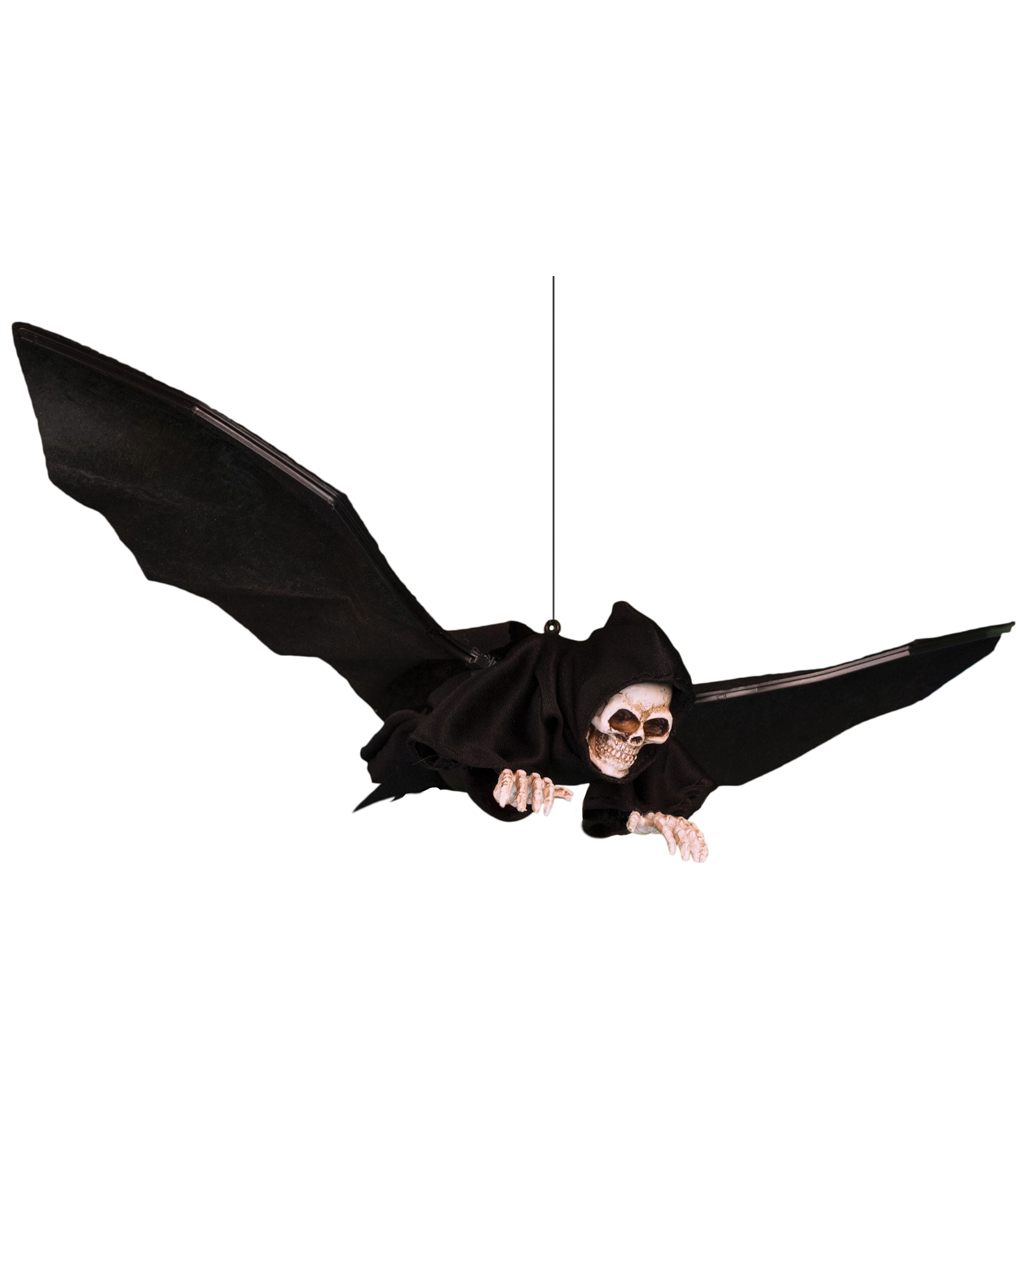 BATS PACK OF 4 BATS PLASTIC PARTY DECORATION HALLOWEEN WEB ACCESSORY 11CM